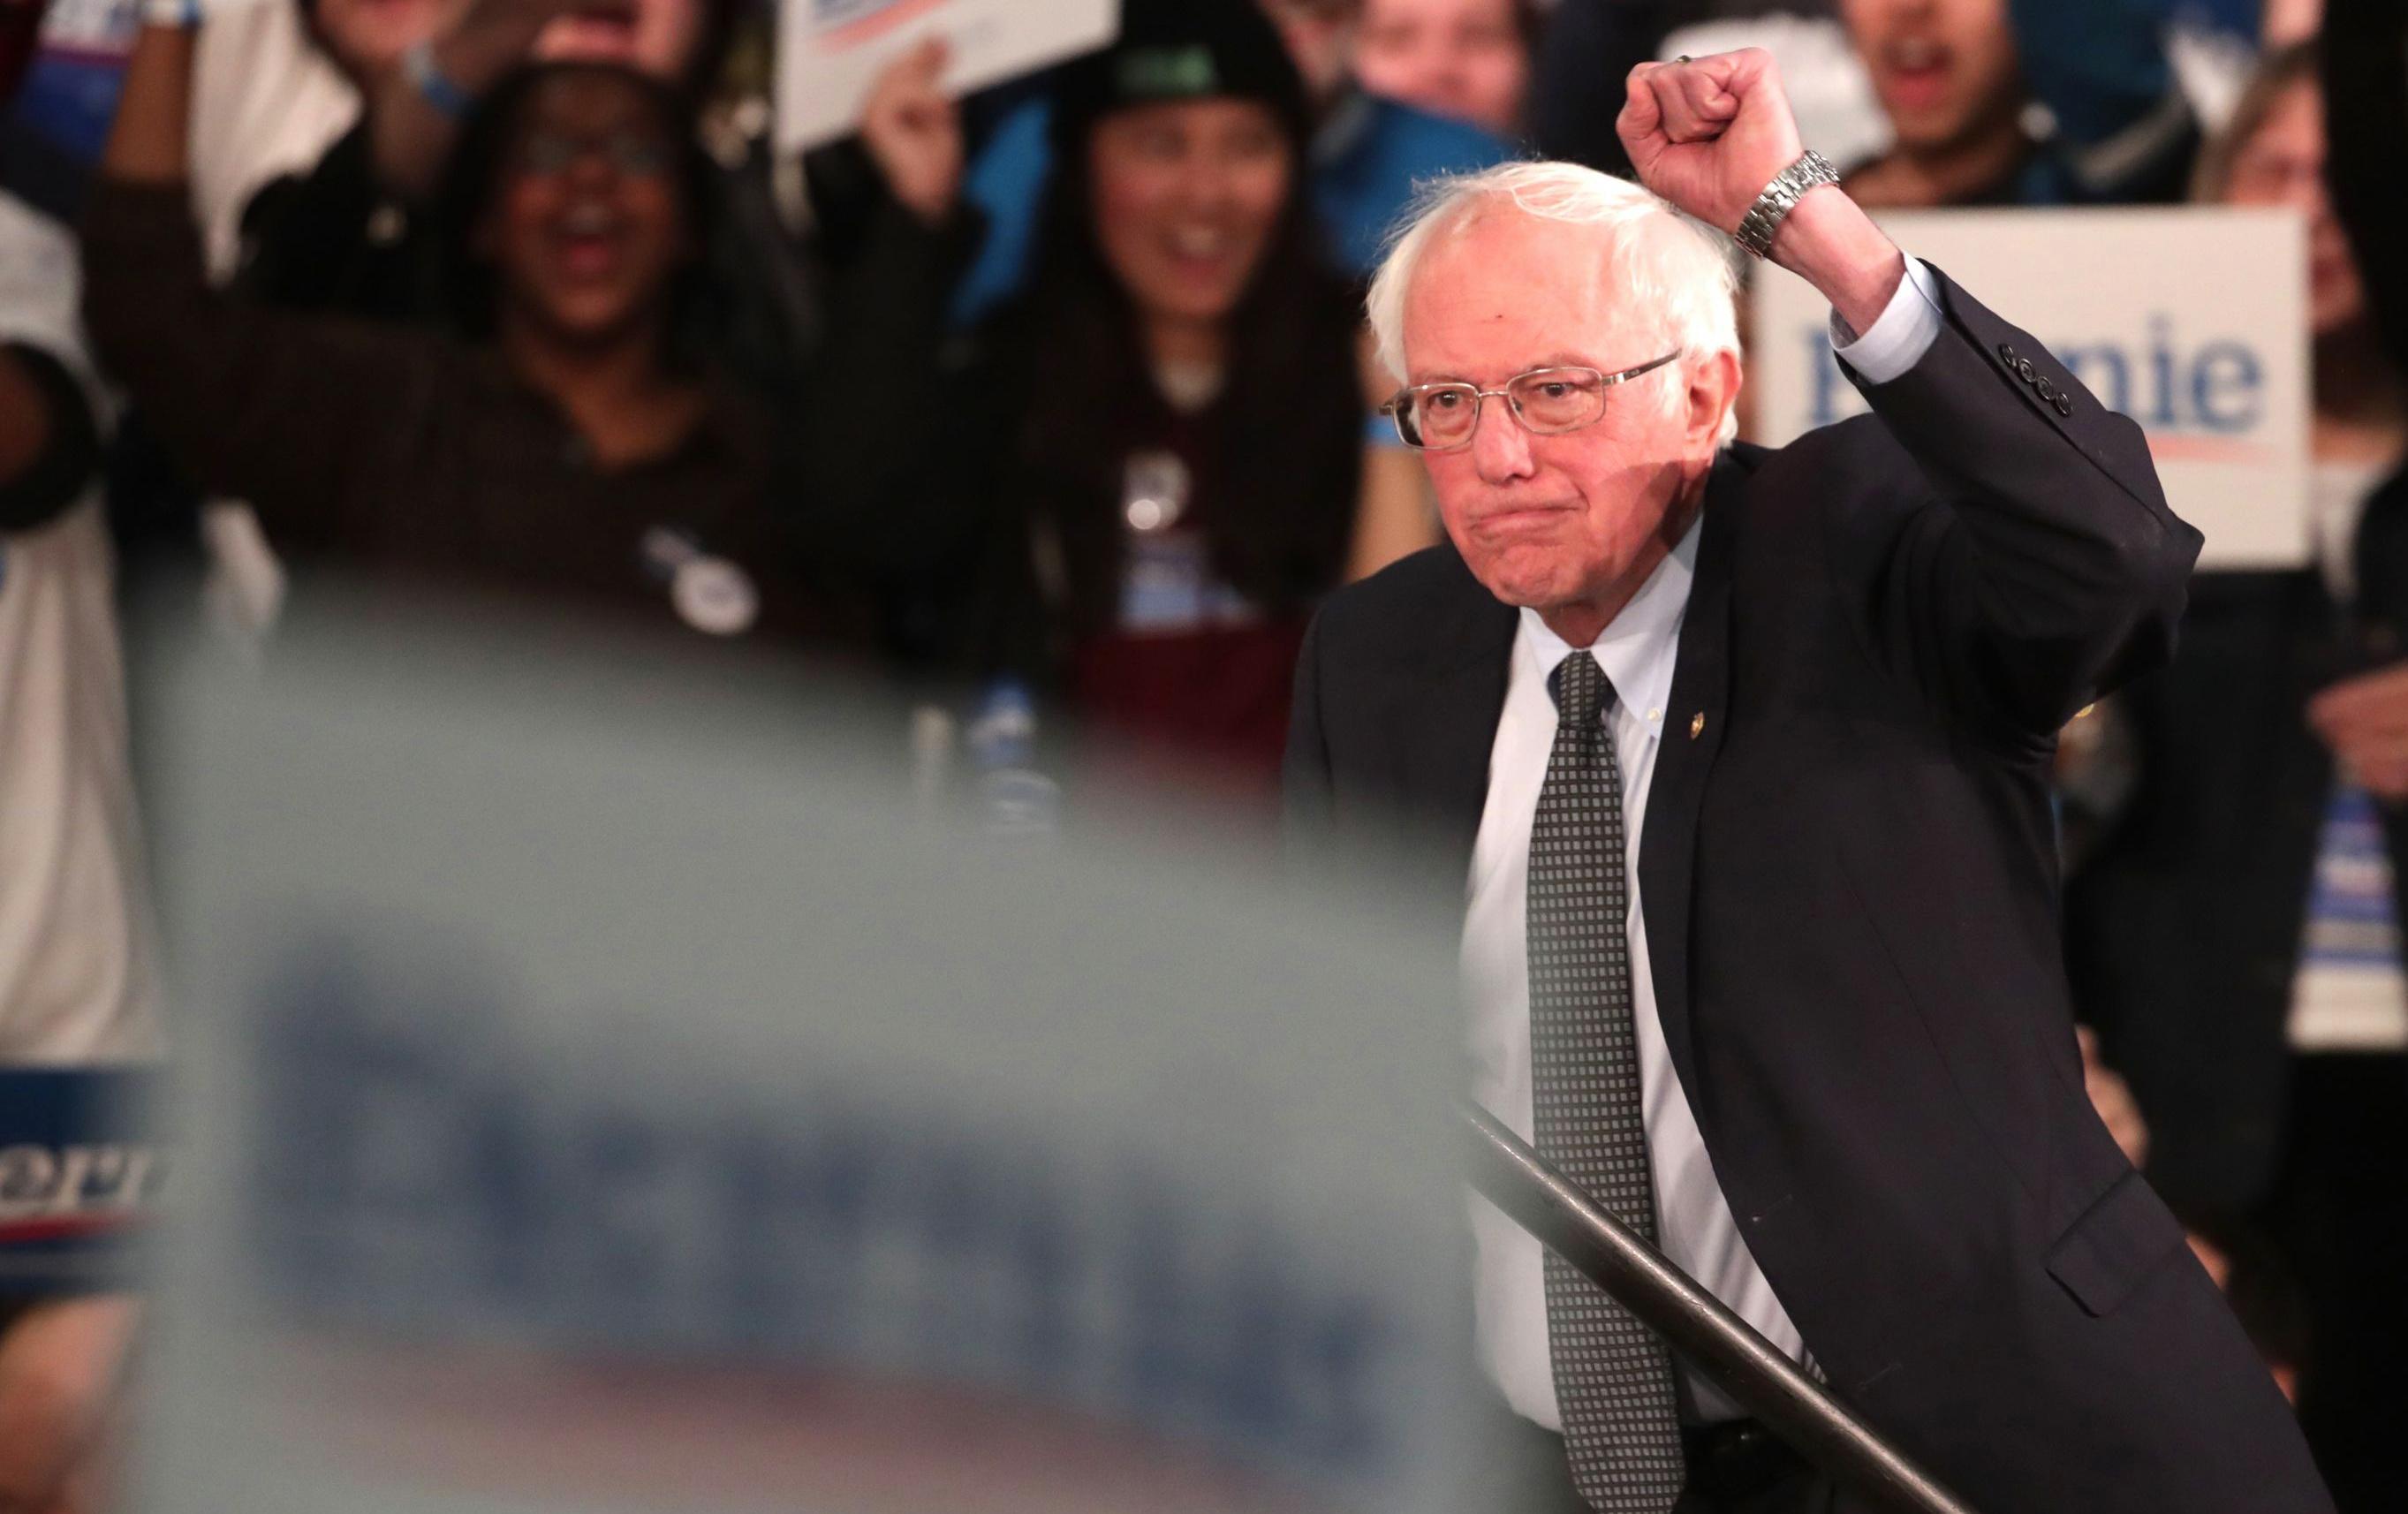 I helped coin the term 'identity politics'. I'm endorsing Bernie Sanders